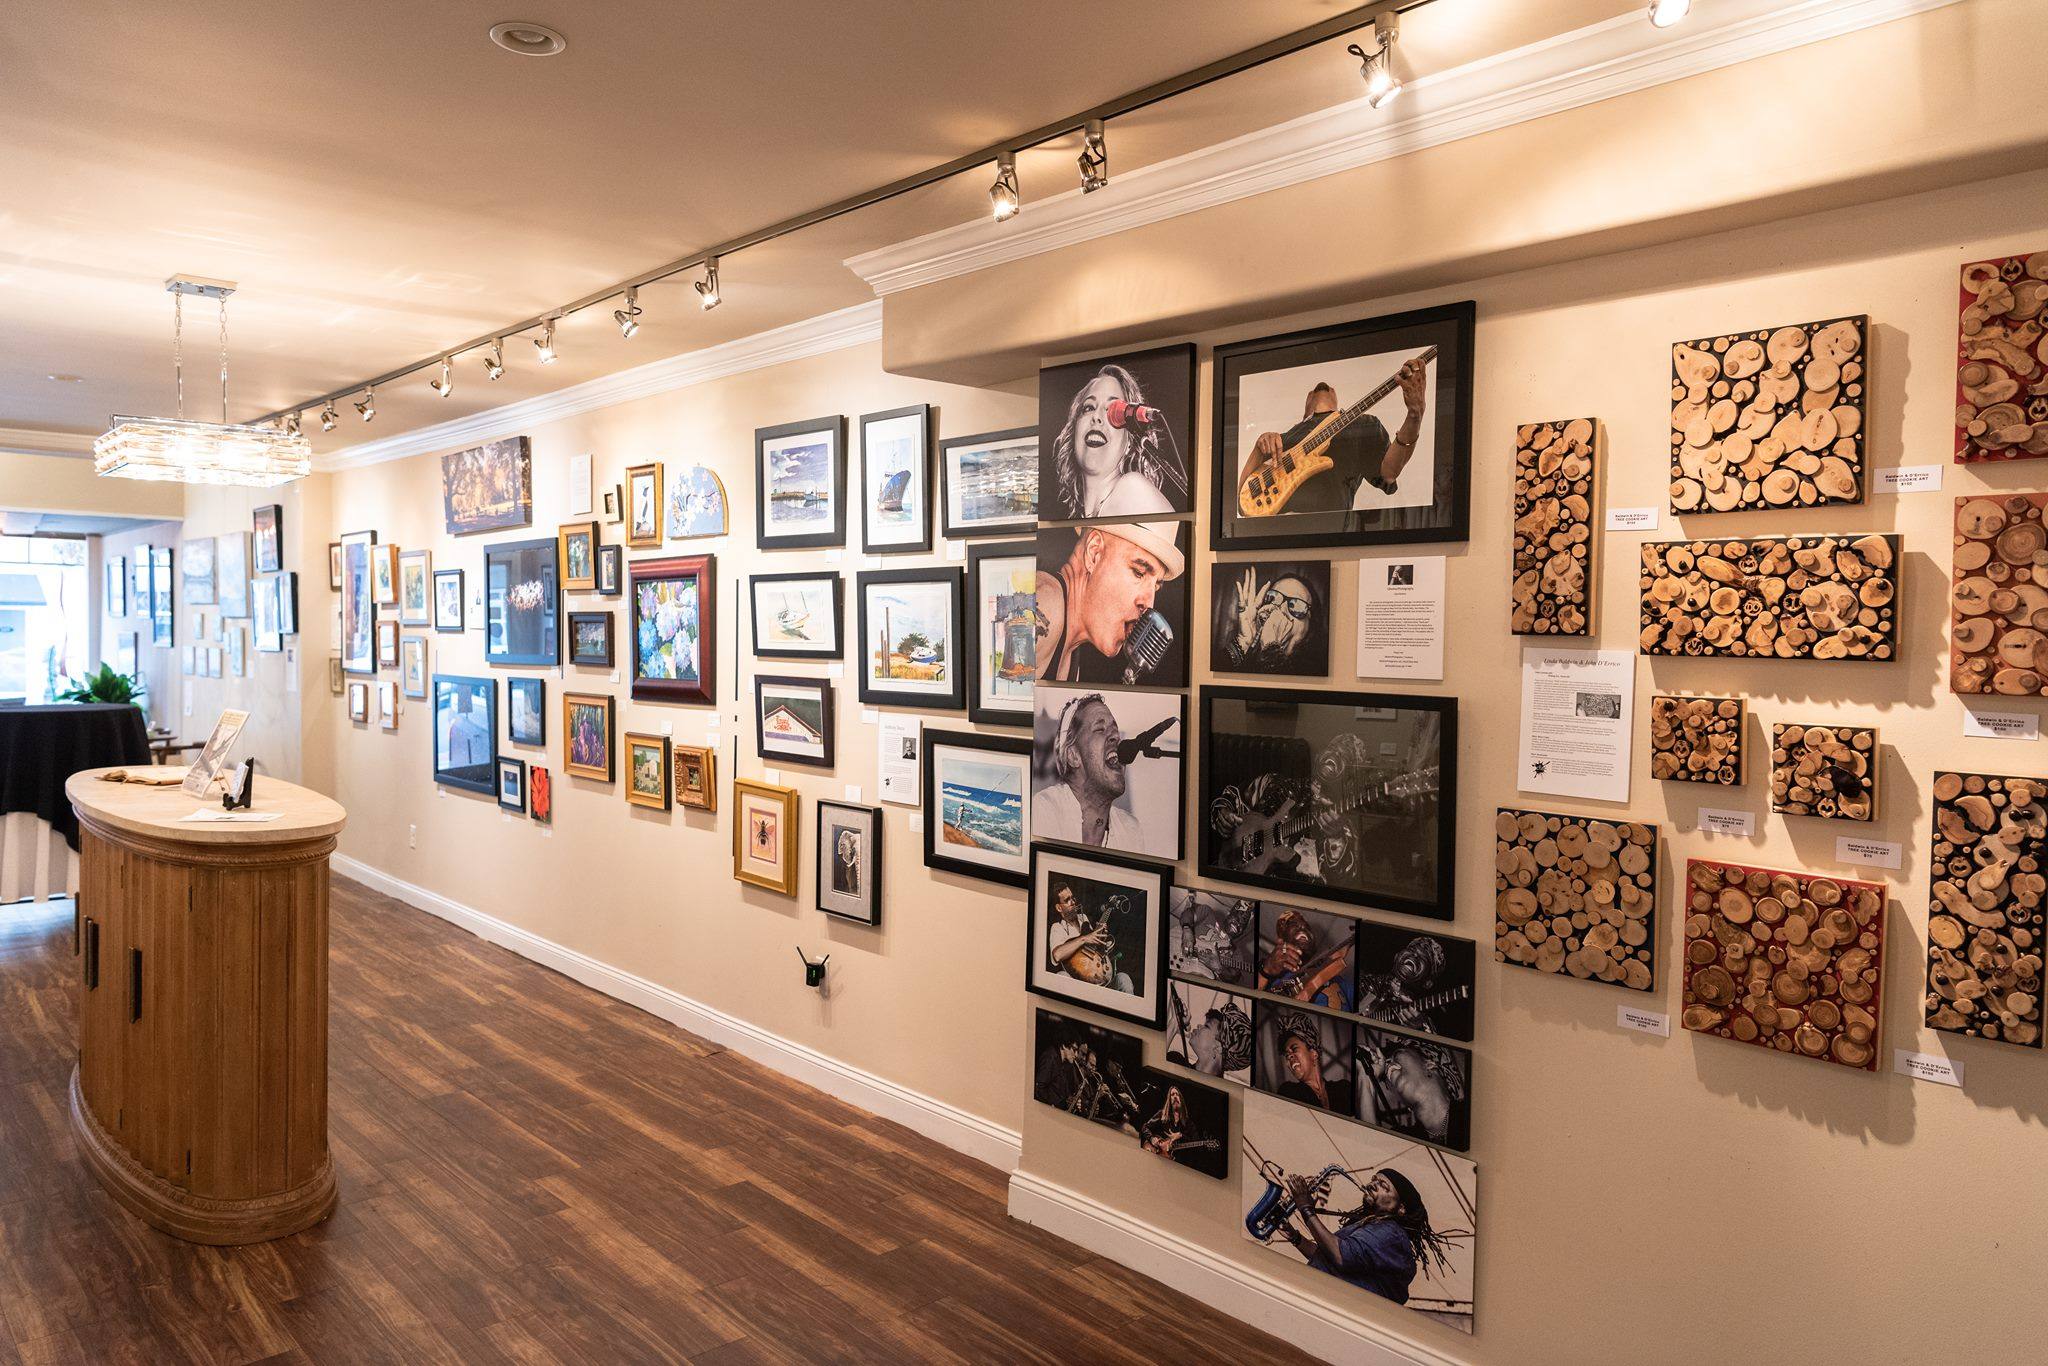 Mill Street Music Photography Exibition & Reception 2018.jpg